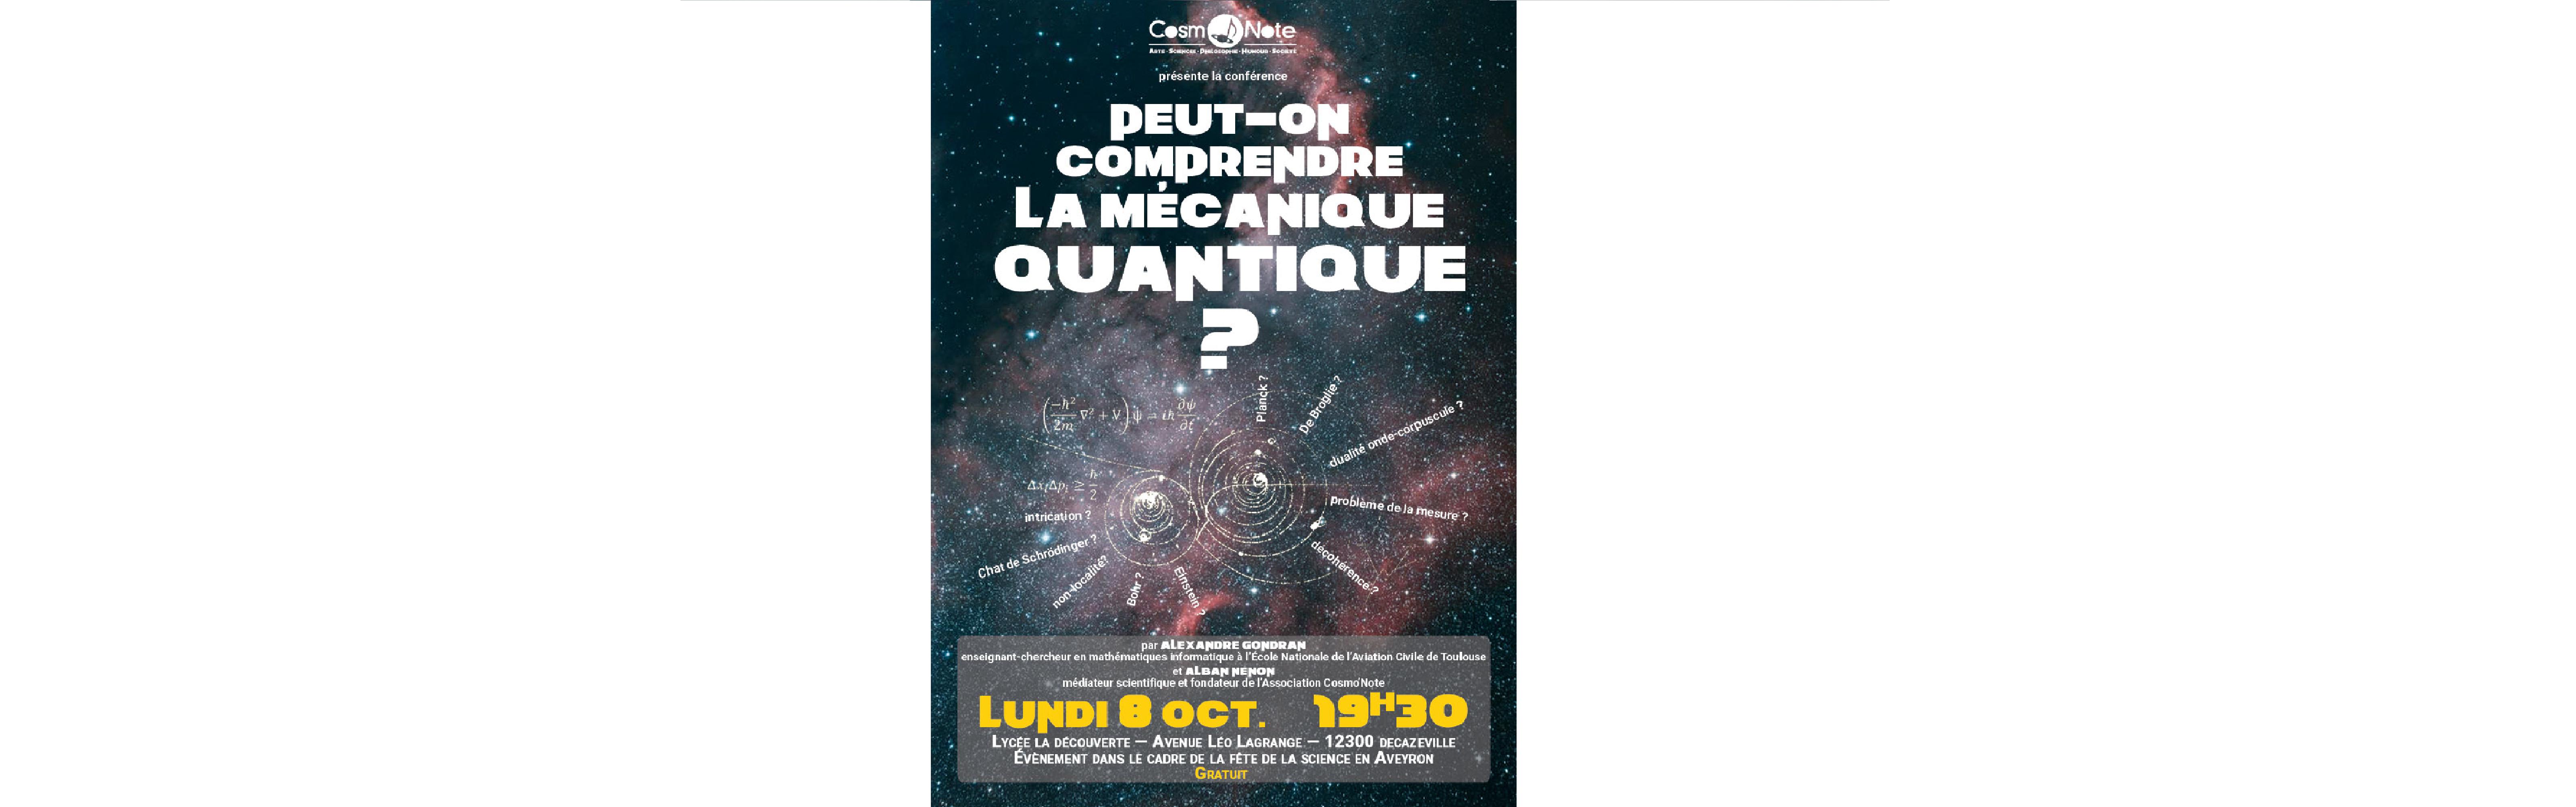 Journée Relais Exposcience - Conférence Cosmo\'Note